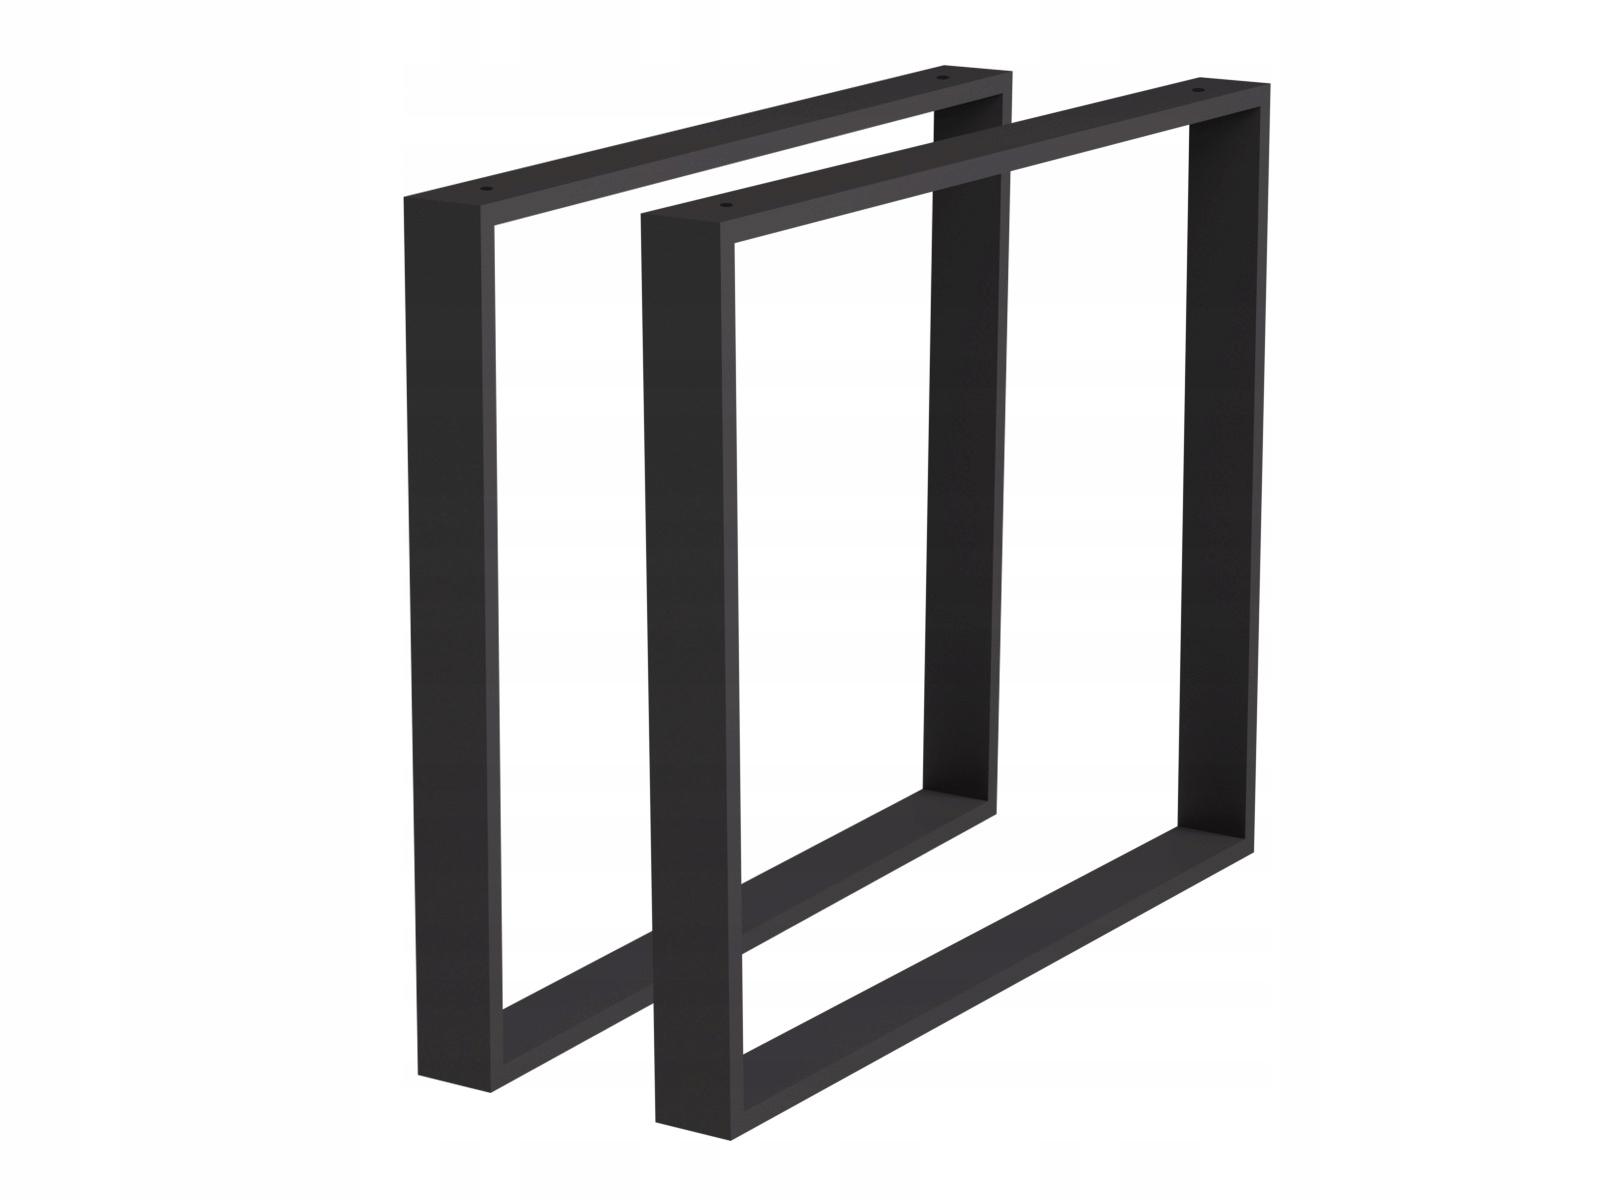 2 LOFT TABLE LEGS BLACK ALU BASE 600x420 mm